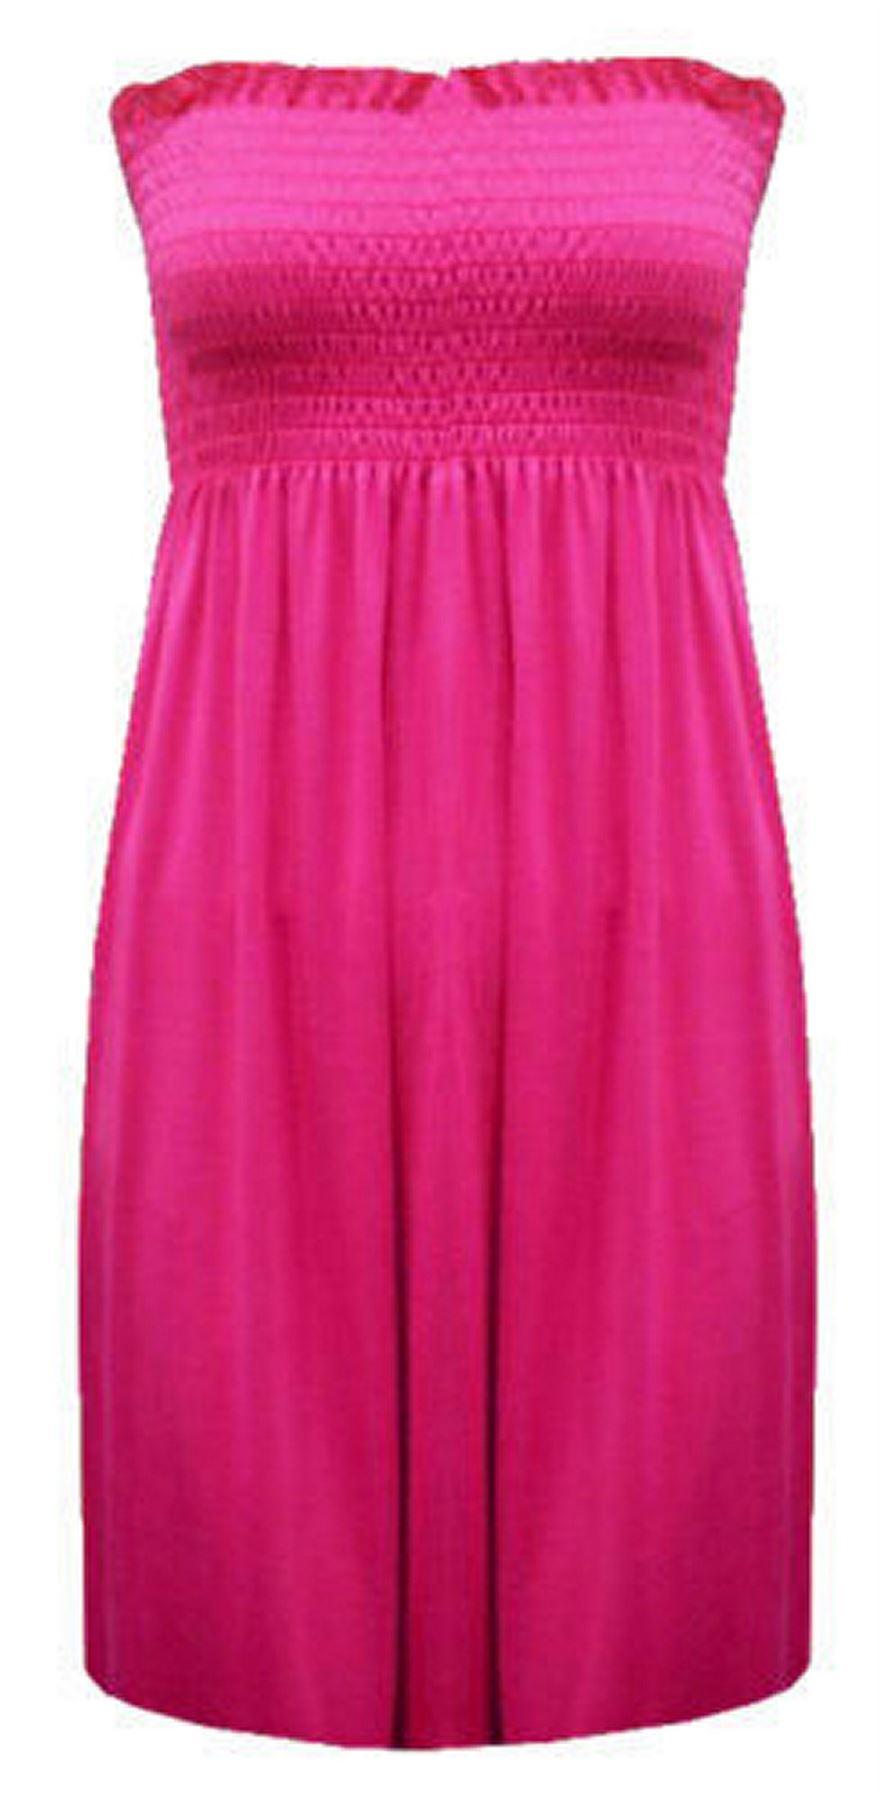 New-Ladies-Bandeau-Boob-Gathering-Tops-Boob-Tube-Beach-Wear-Tunics-8-26 thumbnail 20